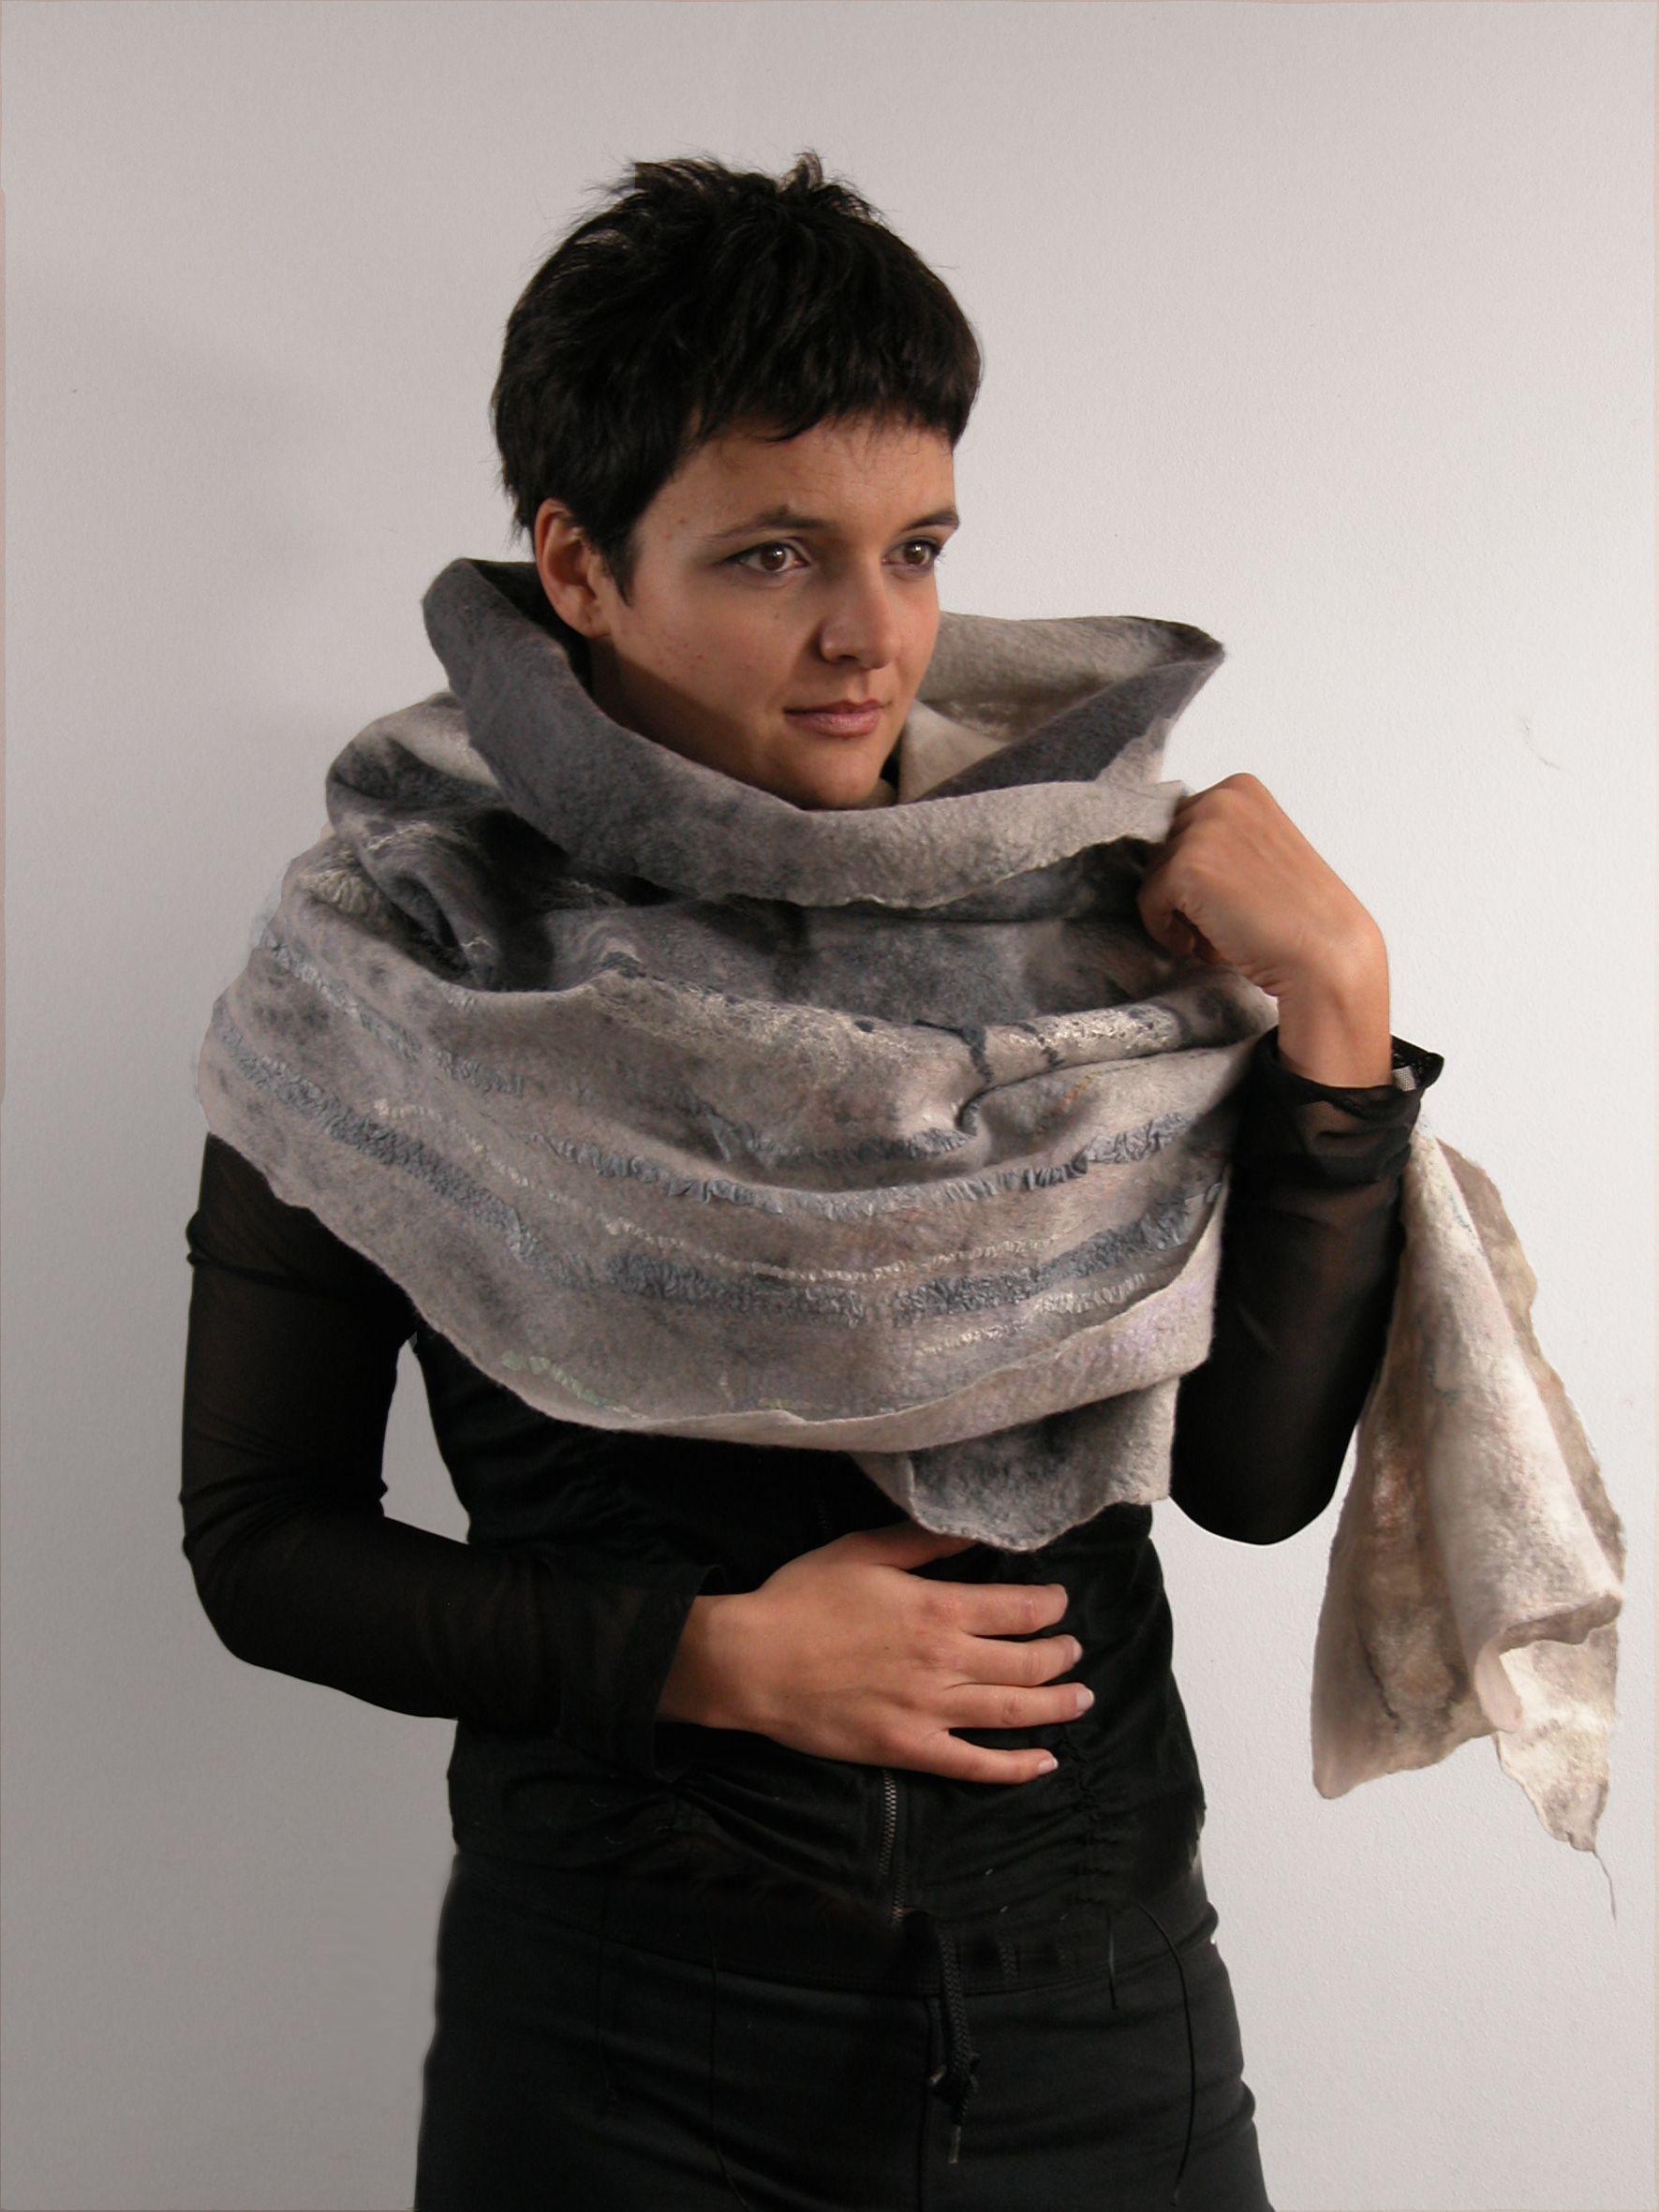 gray felted scarf. majoffe.blogspot.com, facebook majoffe